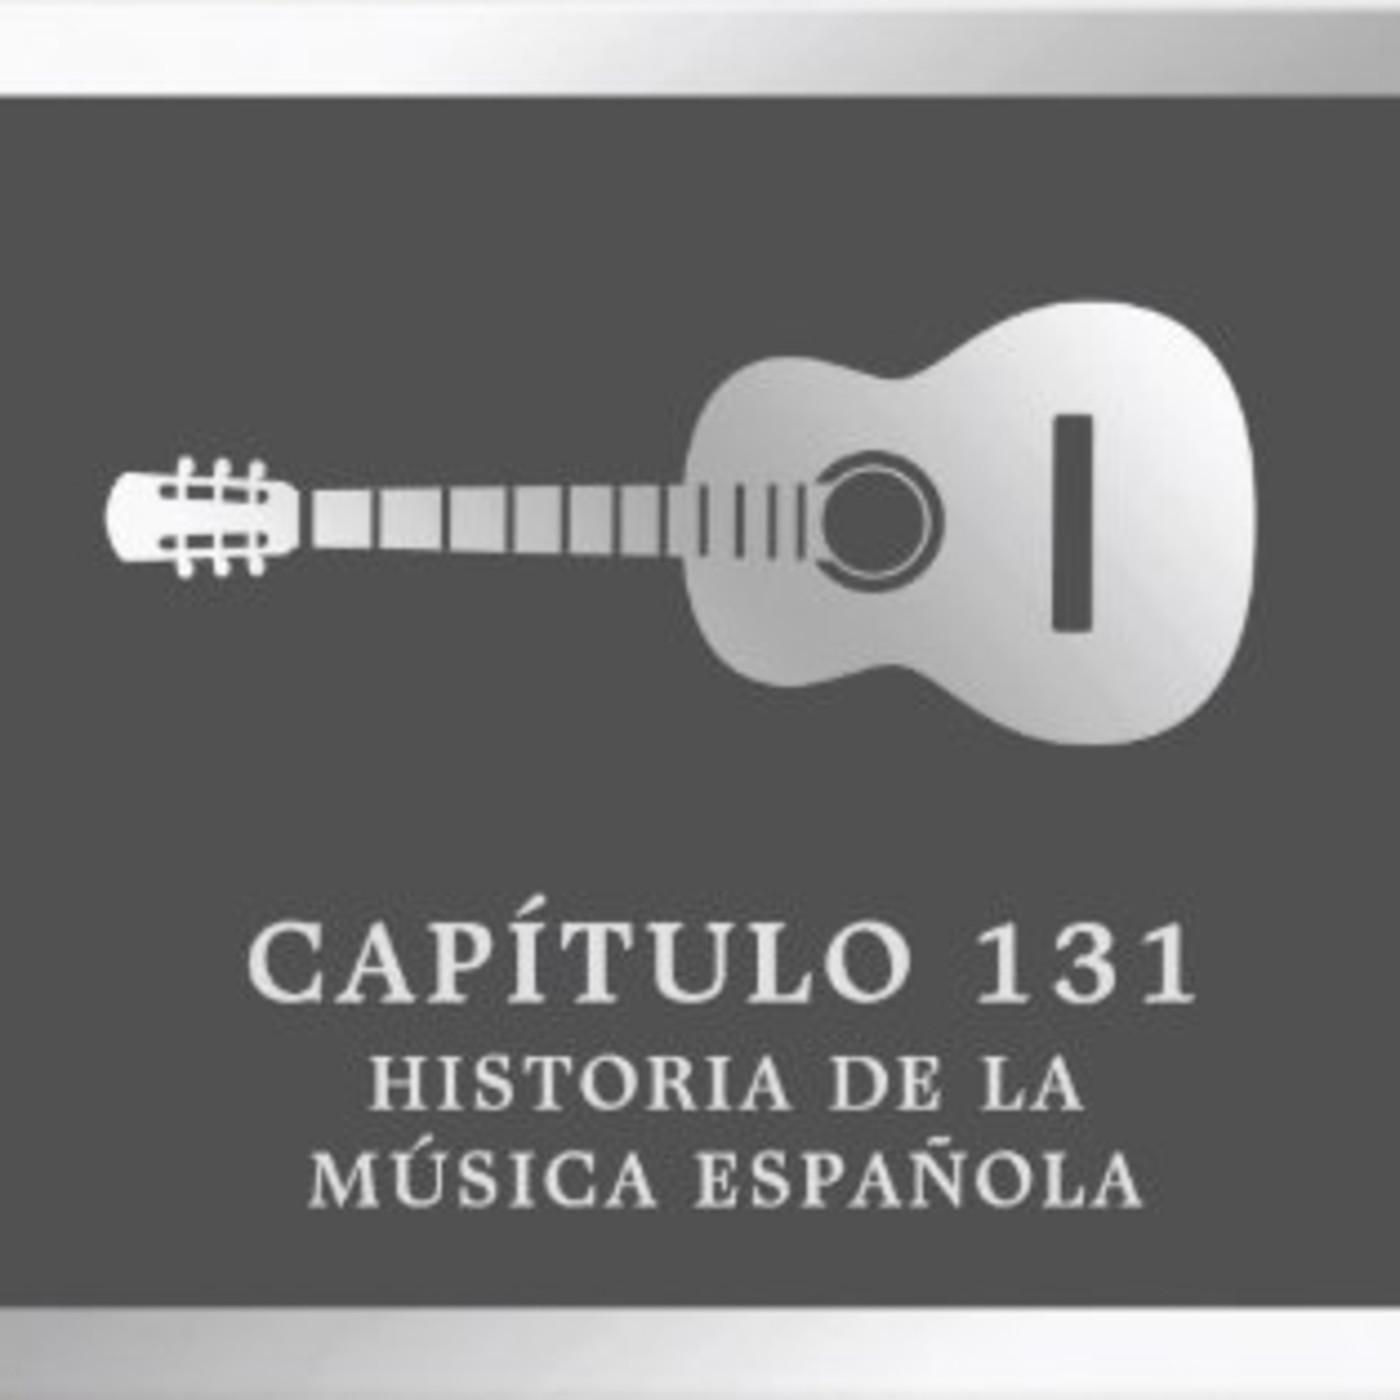 Programa 131 de Historia de la Música Española